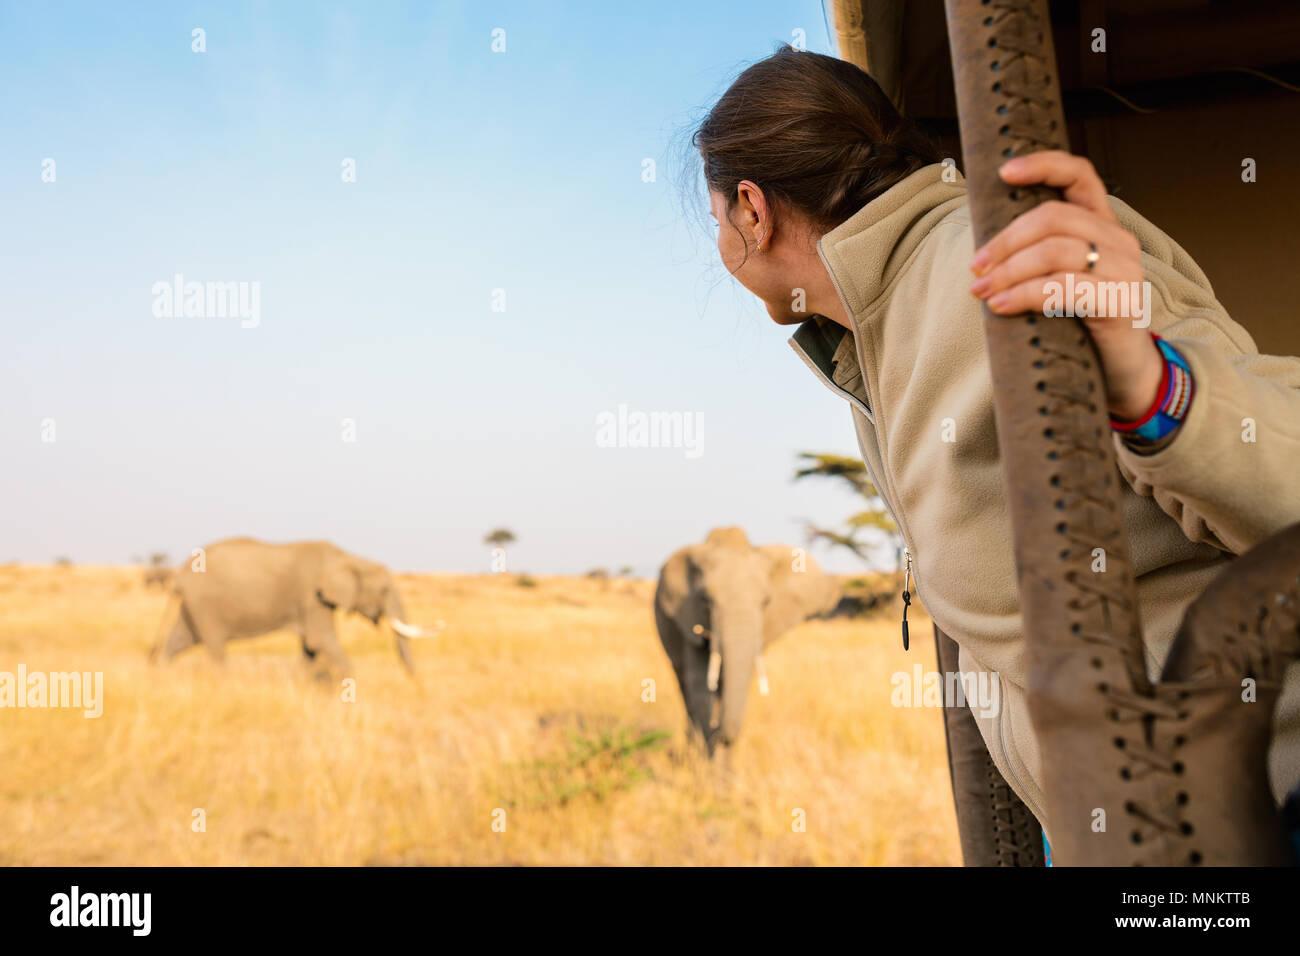 Woman on safari game drive enjoying close encounter with elephants in Kenya Africa - Stock Image